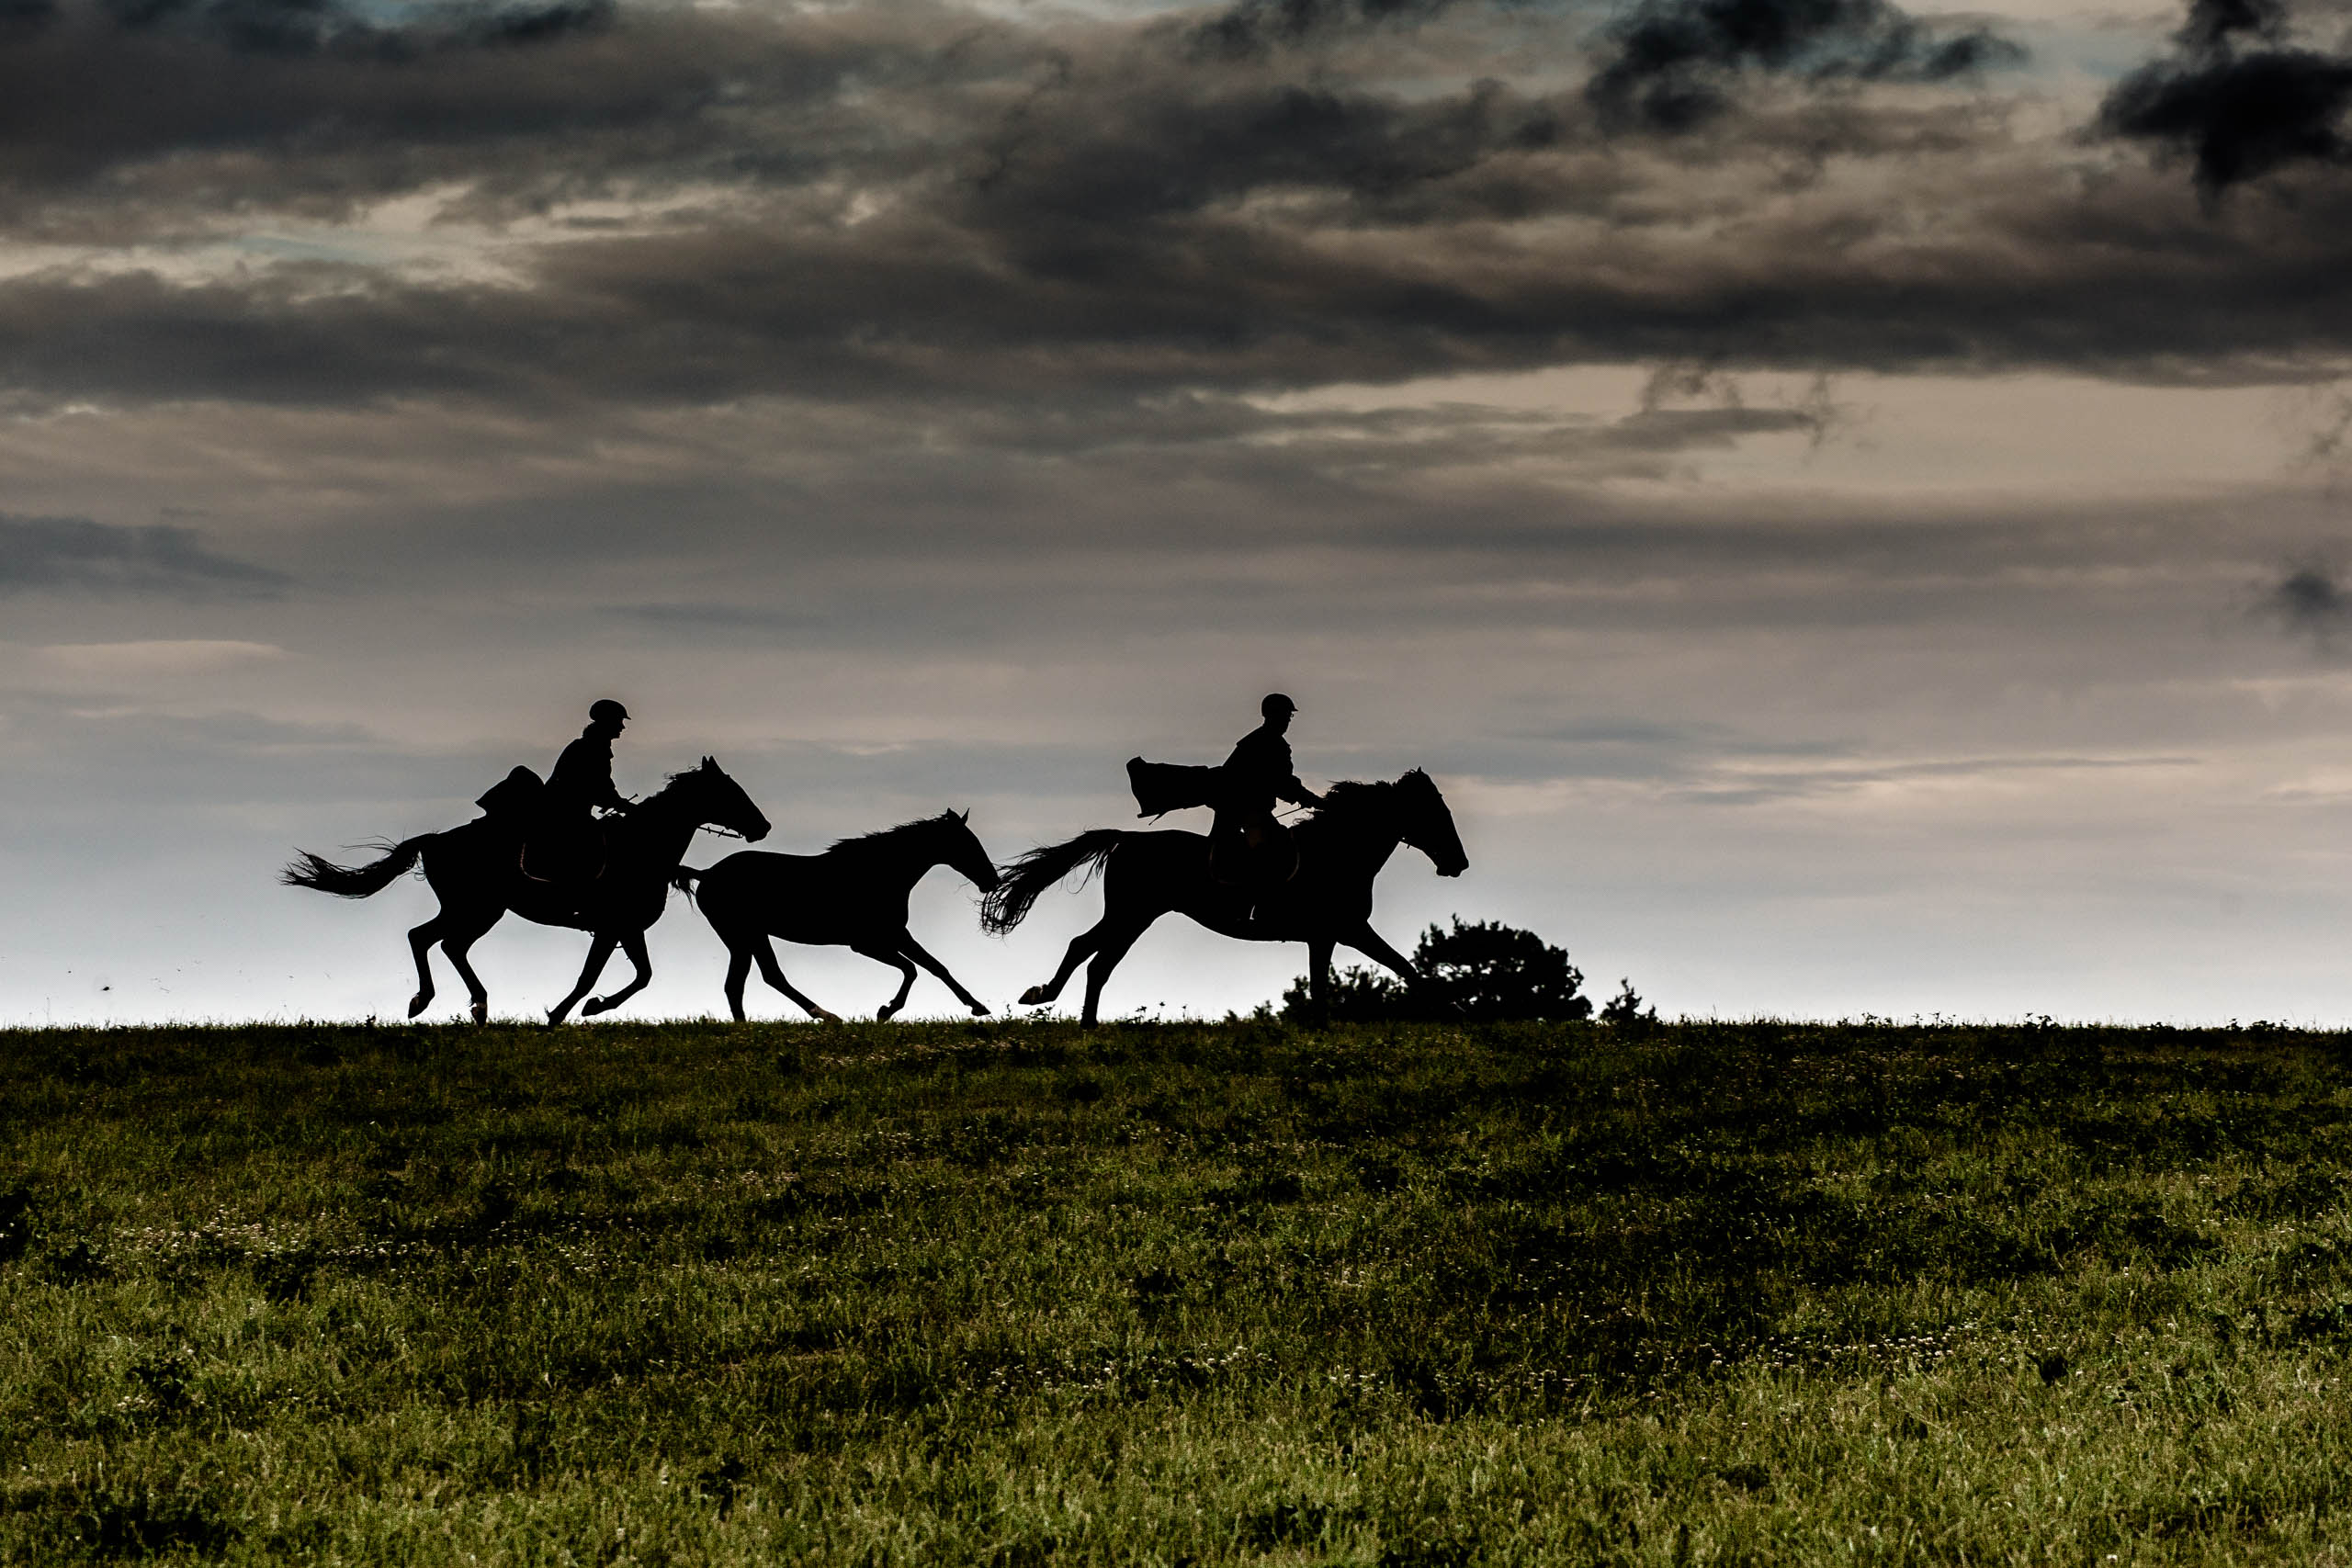 konie, horses, Warmia and Mazury, horse riding